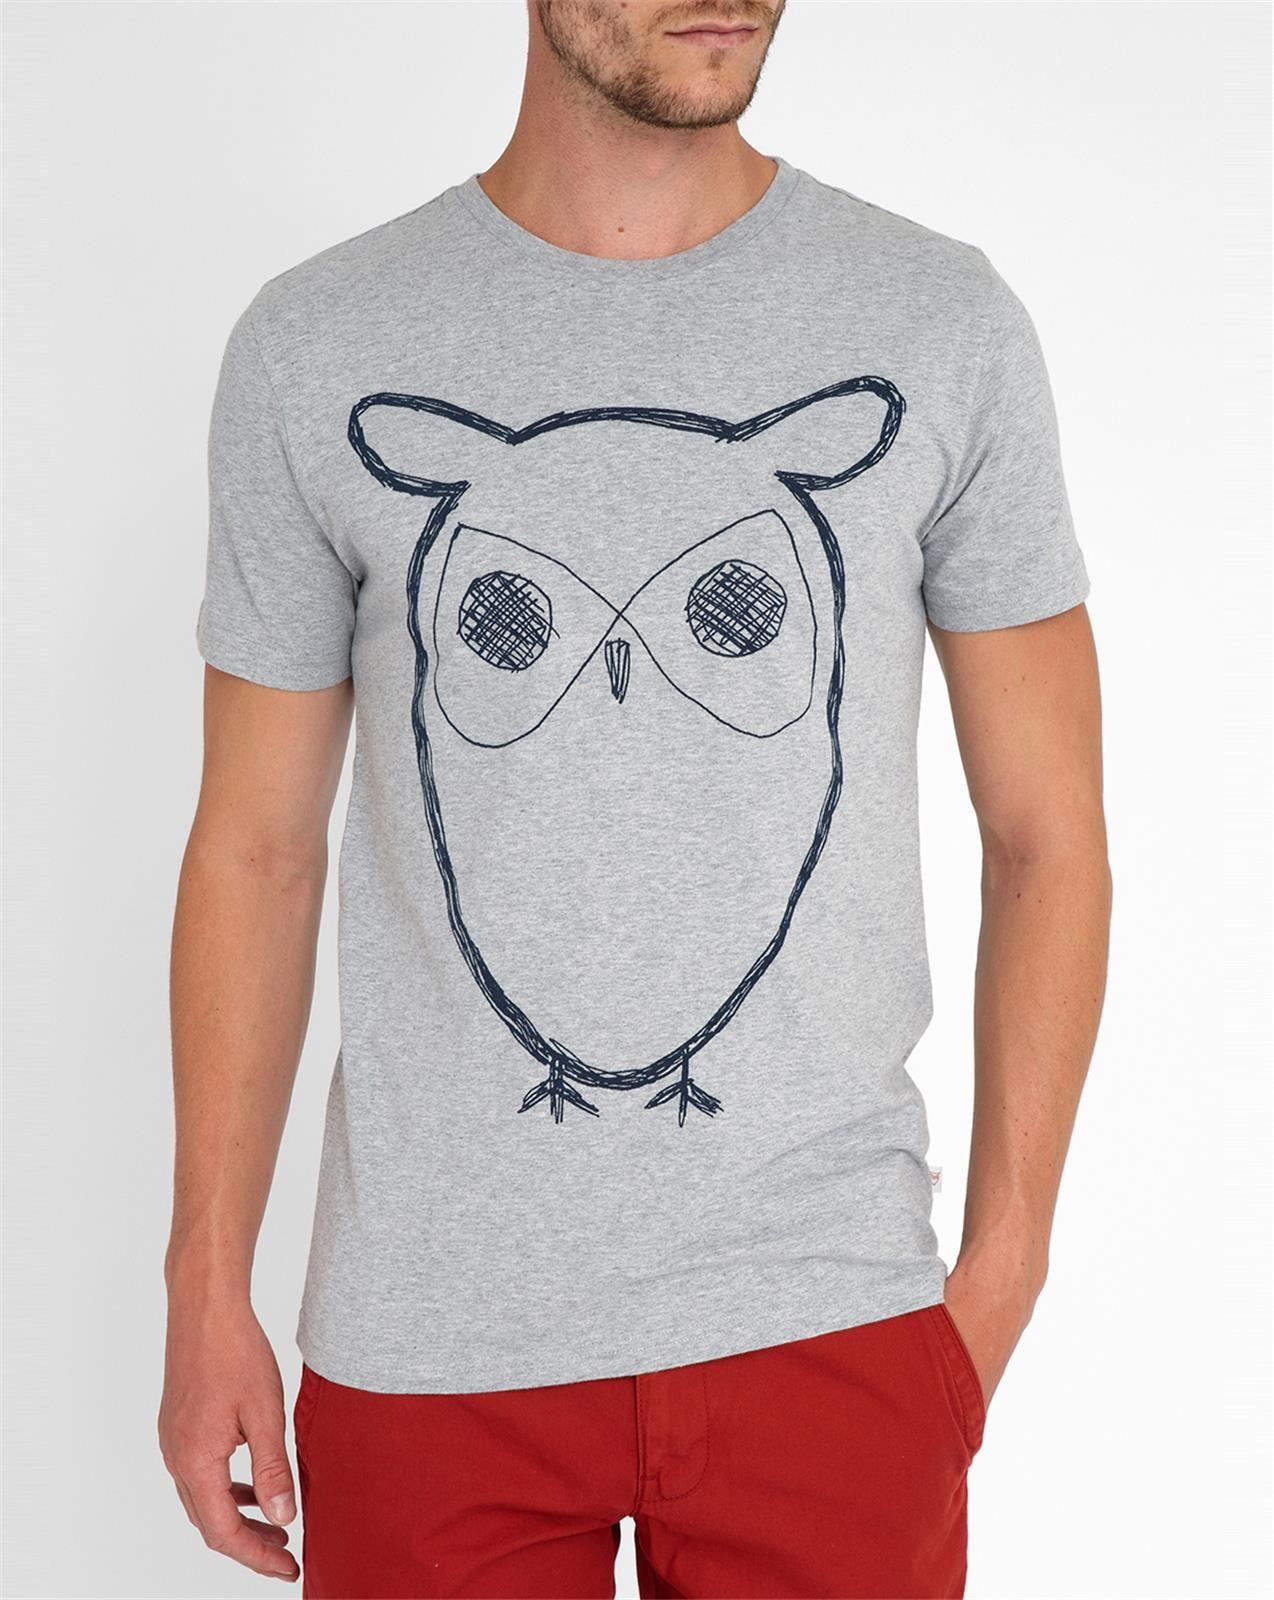 knowledge cotton apparel grey owl logo short sleeve t shirt in gray for men lyst. Black Bedroom Furniture Sets. Home Design Ideas